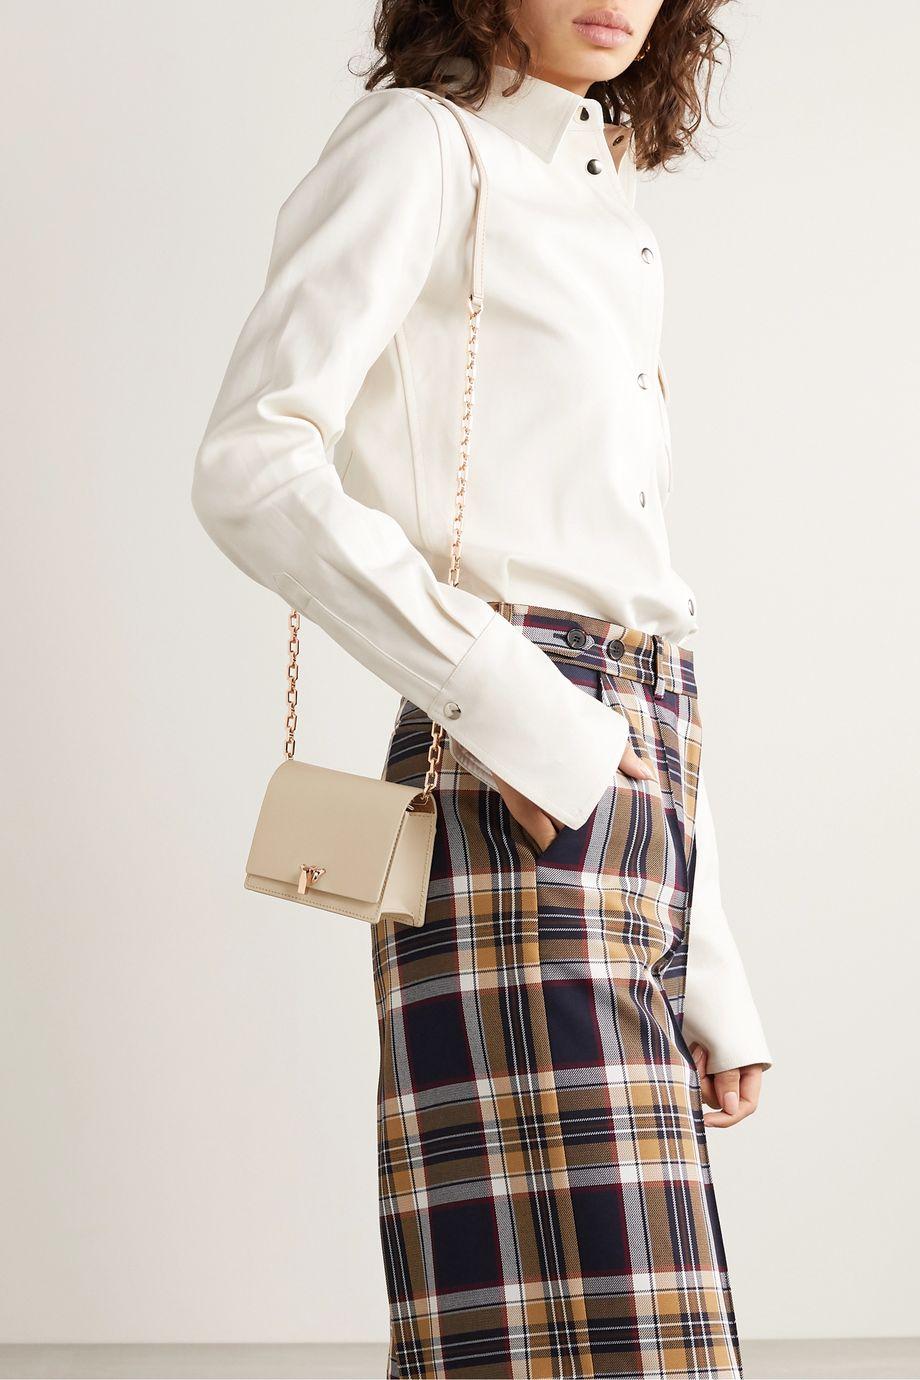 THE VOLON Po Pocket mini leather shoulder bag